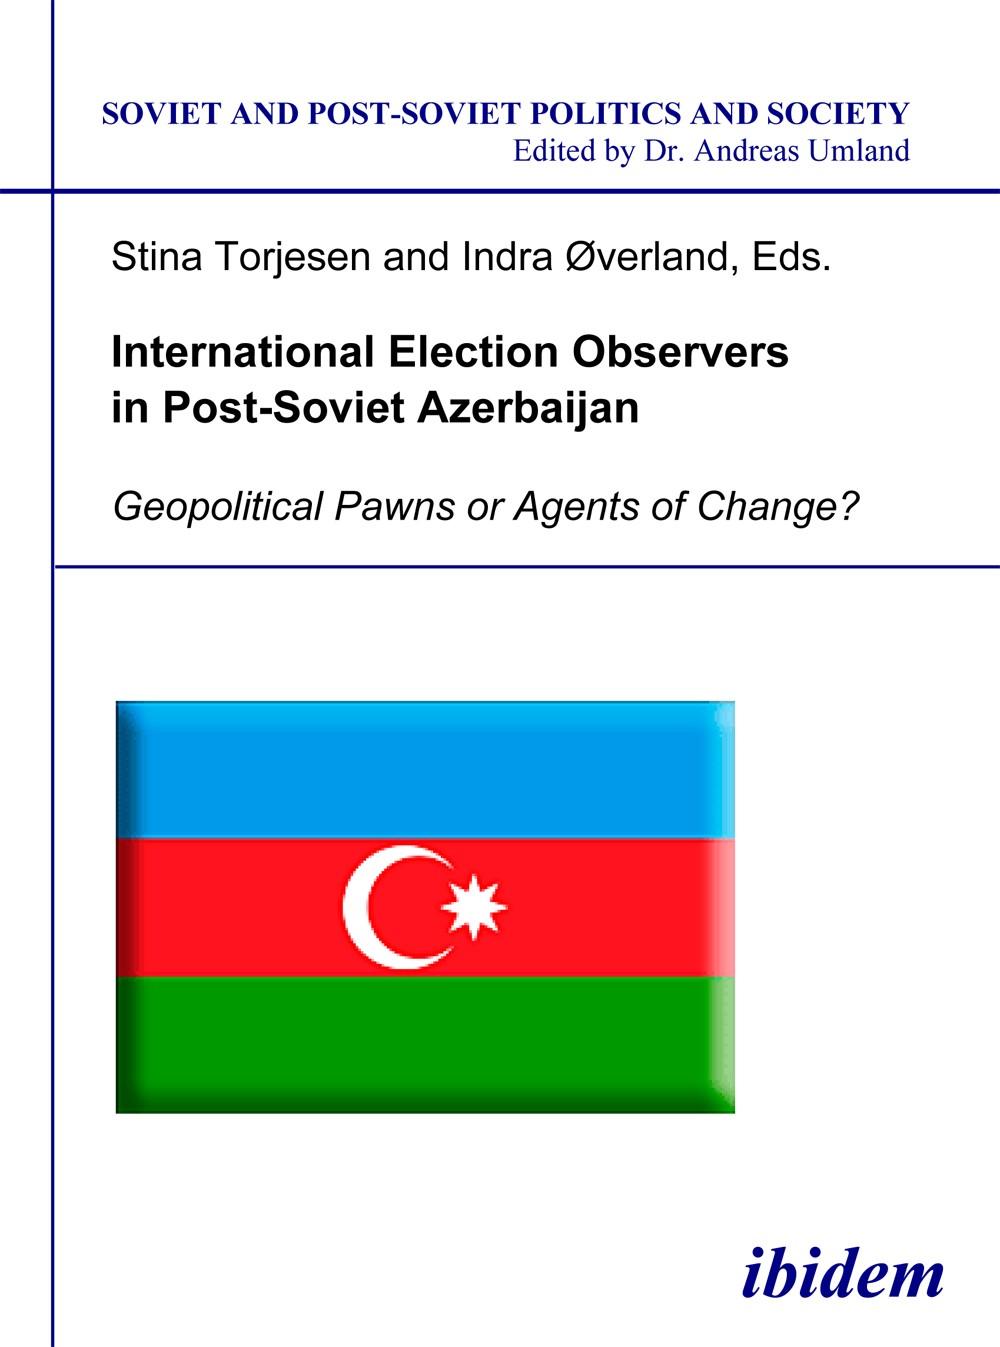 International Election Observers in Post-Soviet Azerbaijan